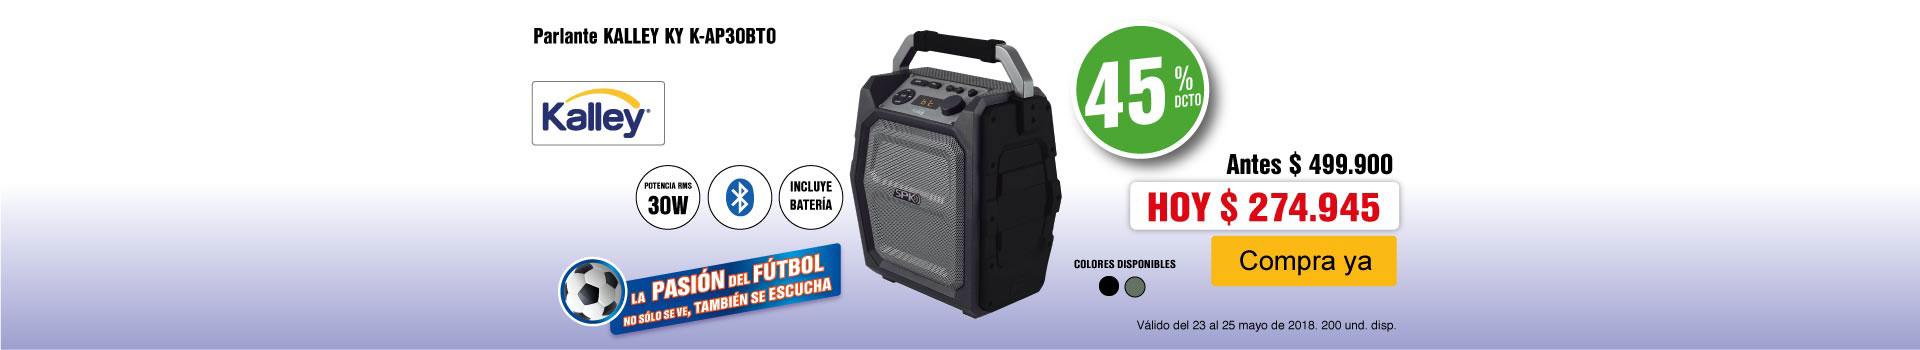 AK-KT-BCAT-2-audio-PP---Kalley-AP30-May23